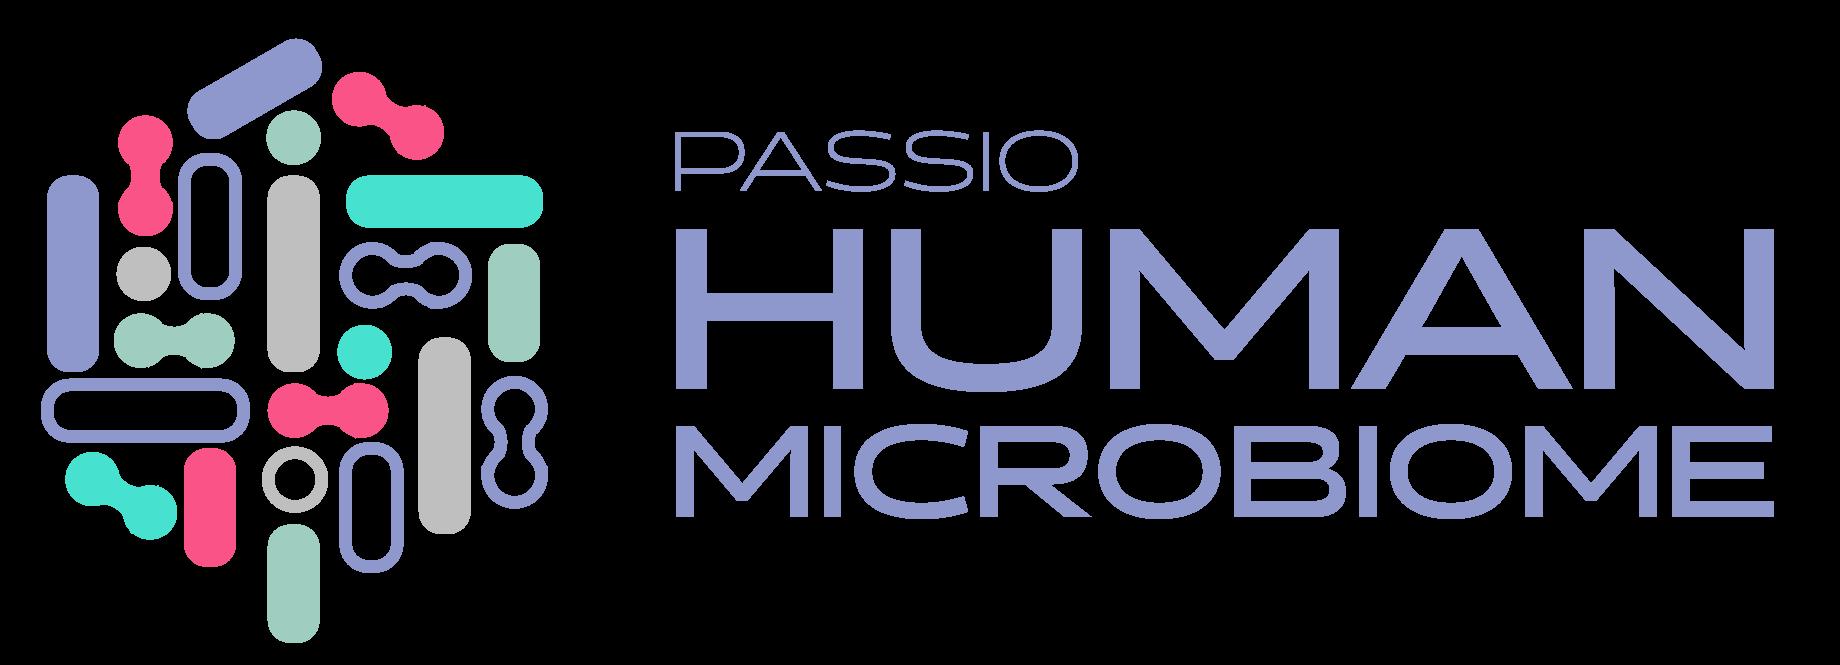 Passio Human Microbiome